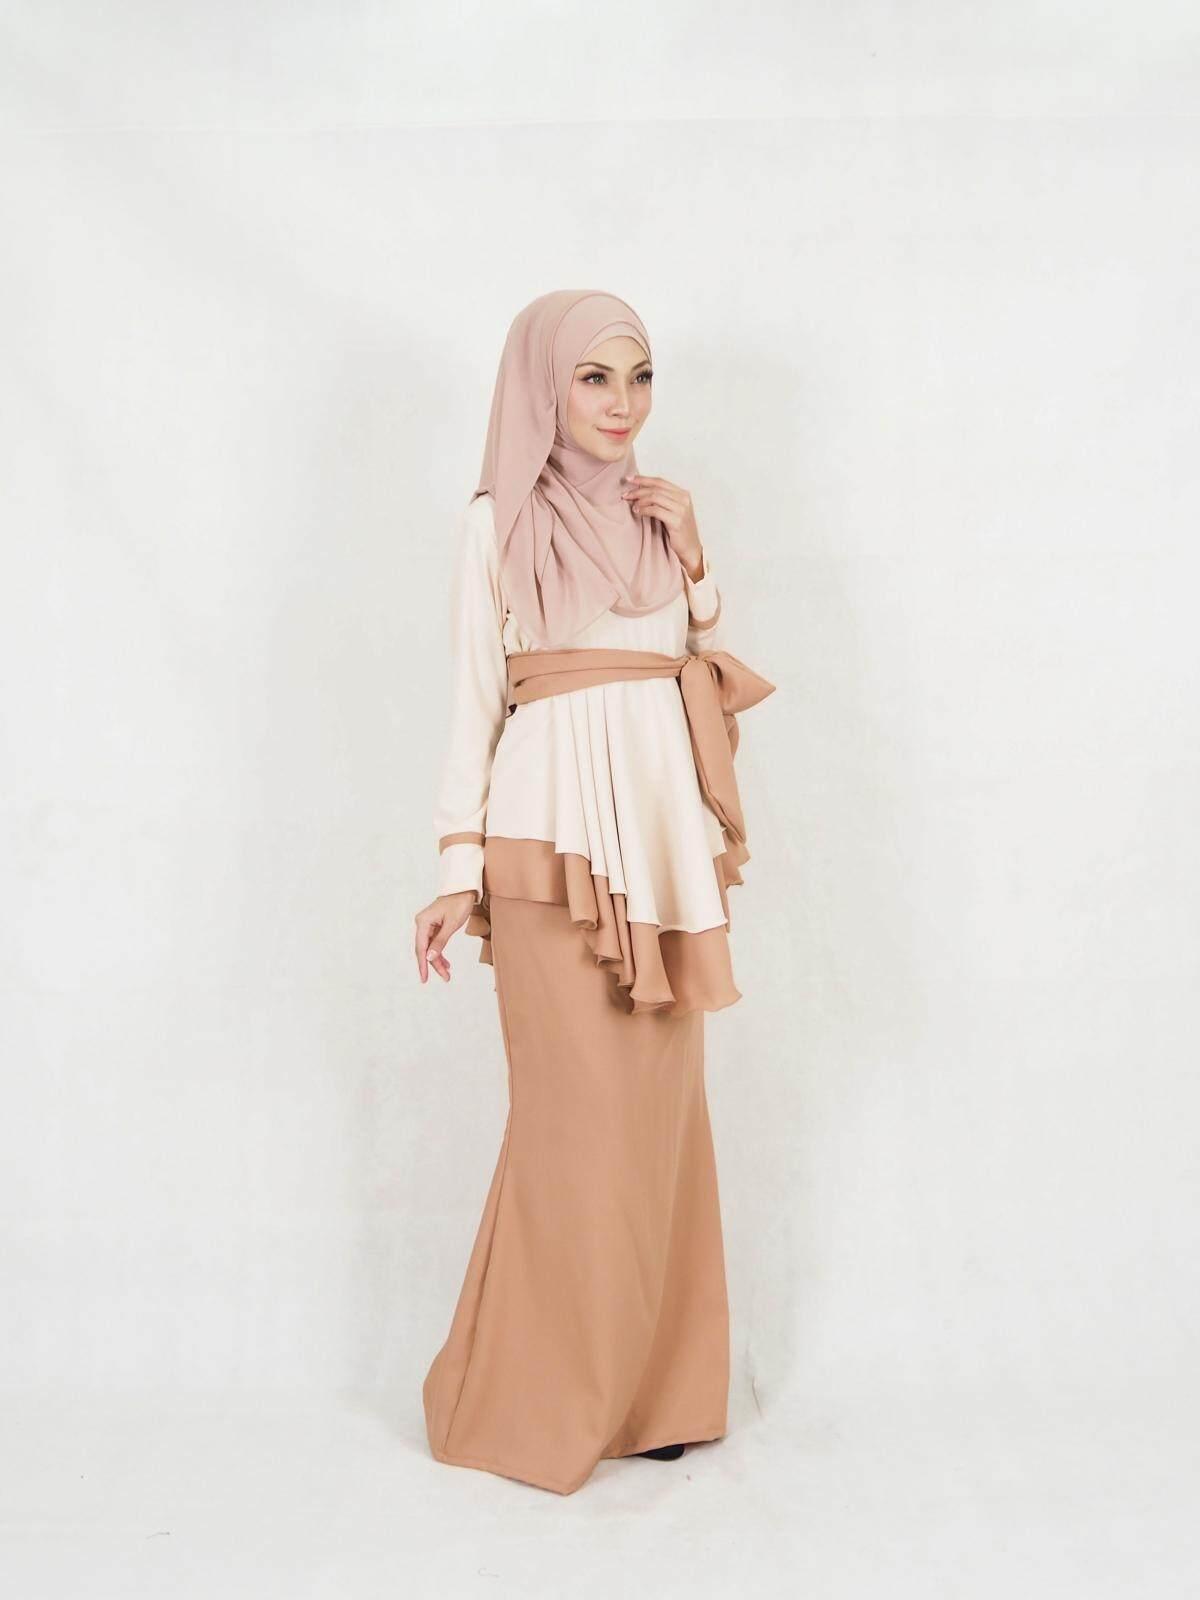 Faria Fara Ribbon Baju Kurung (PLUS SIZE) / Muslim Women Fari Fara Baju Kurung / Muslimah Fashion Modern Ribbon Baju Kurung (XXL-5XL) / Moden Baju Raya Peplum Baju Kurung 2021